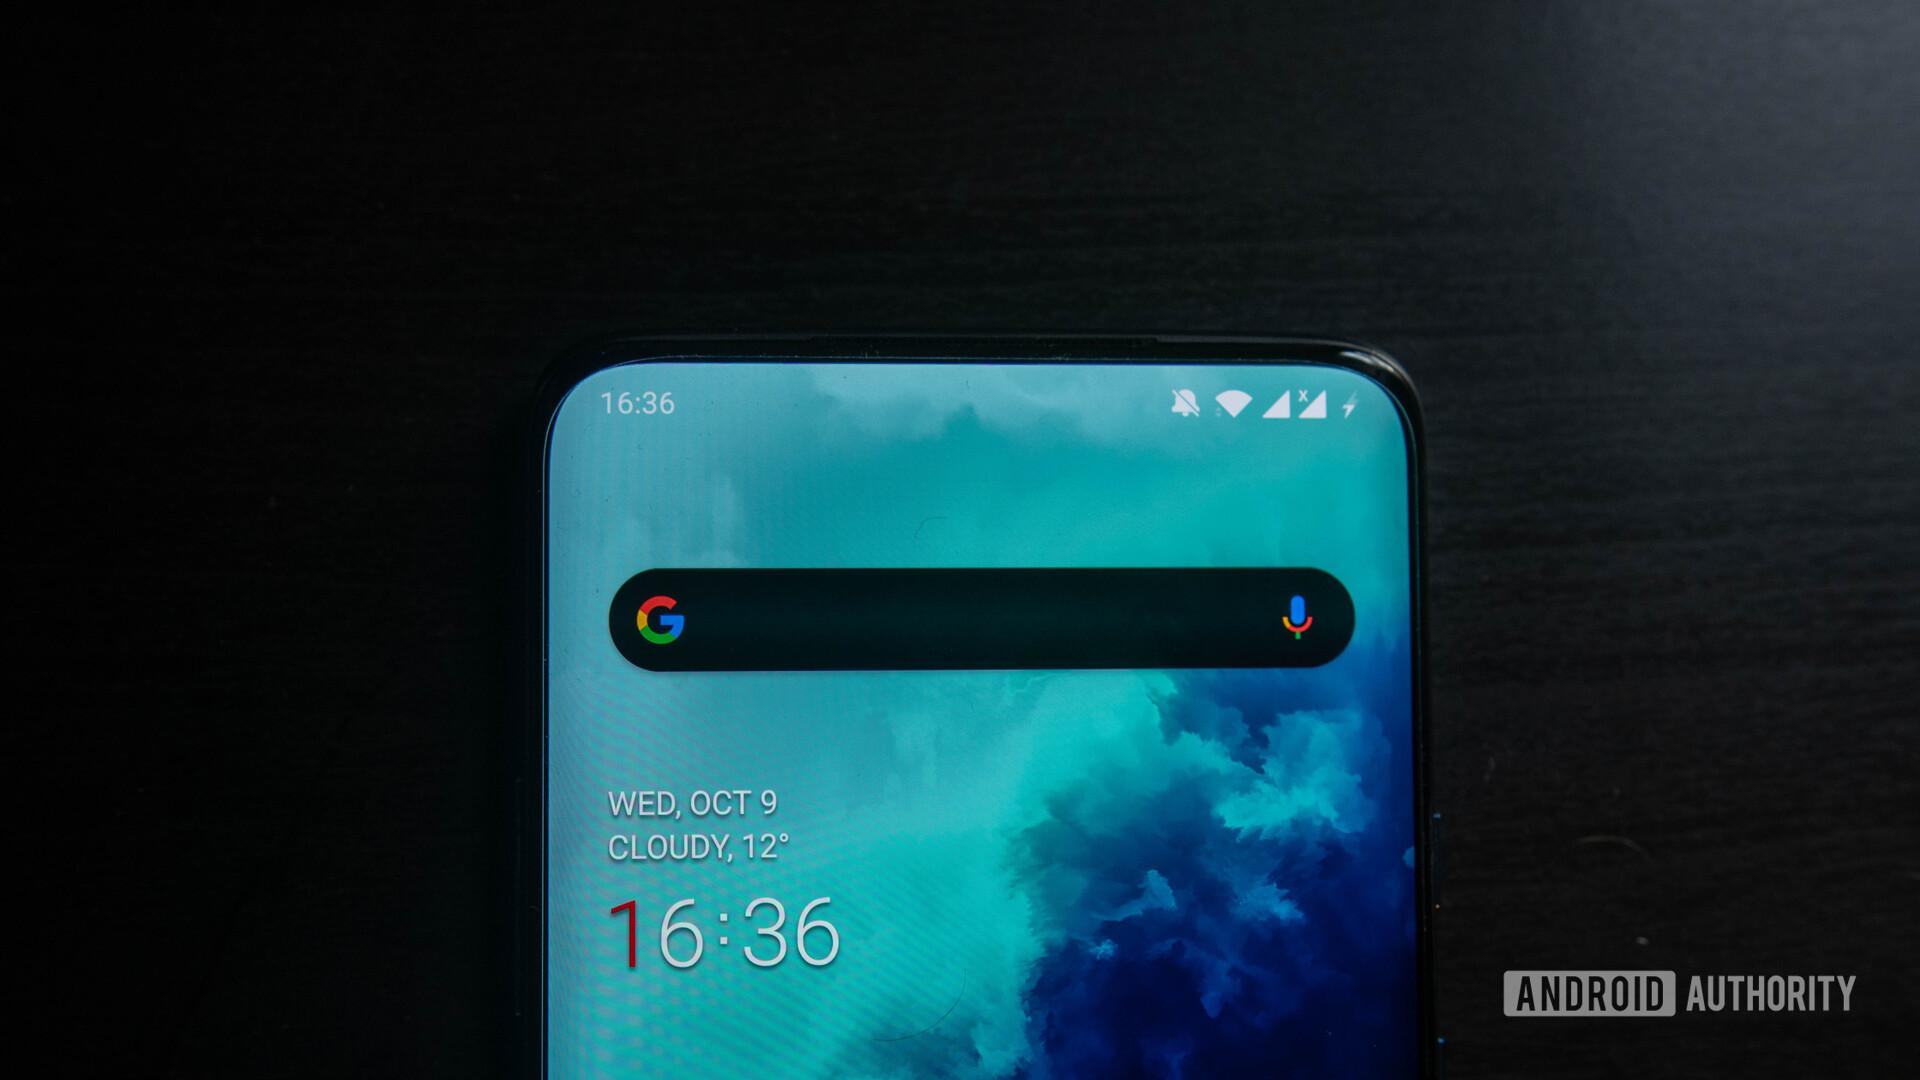 OnePlus 7T Pro front status bar